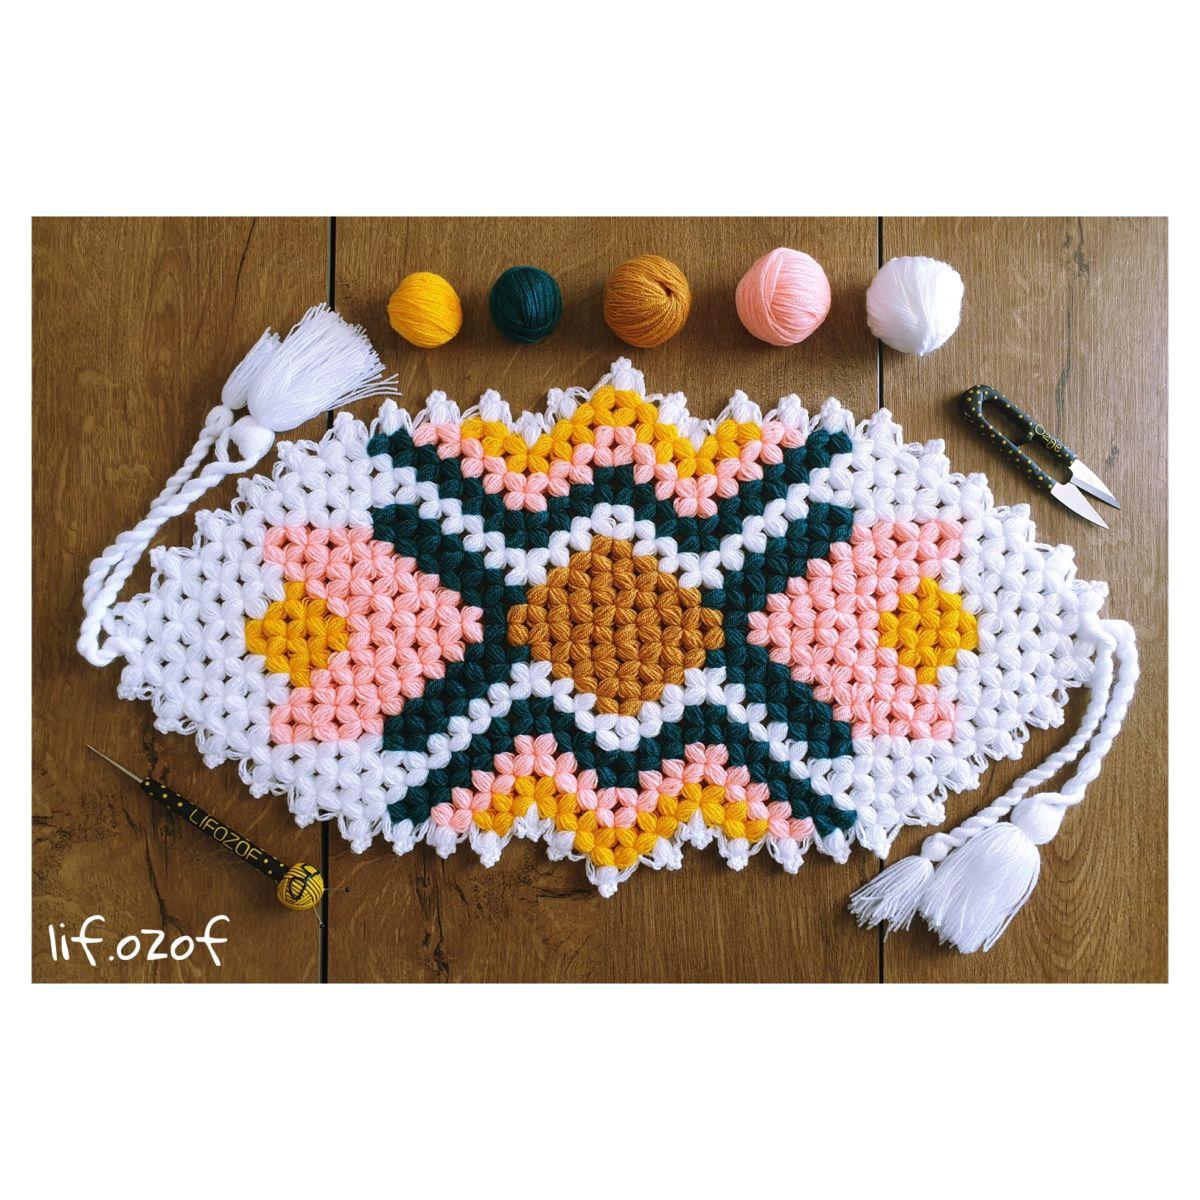 "L İ F O Z O F on Instagram: ""Lalecilik kazanacak😆  Tasarım: @pembe.kucuk.7 ♥ ♥ ♥ ♥ ♥ #ganchillo #crochetlove #pinterest #handmade #crochet #kendinyap #ceyizlik…"""